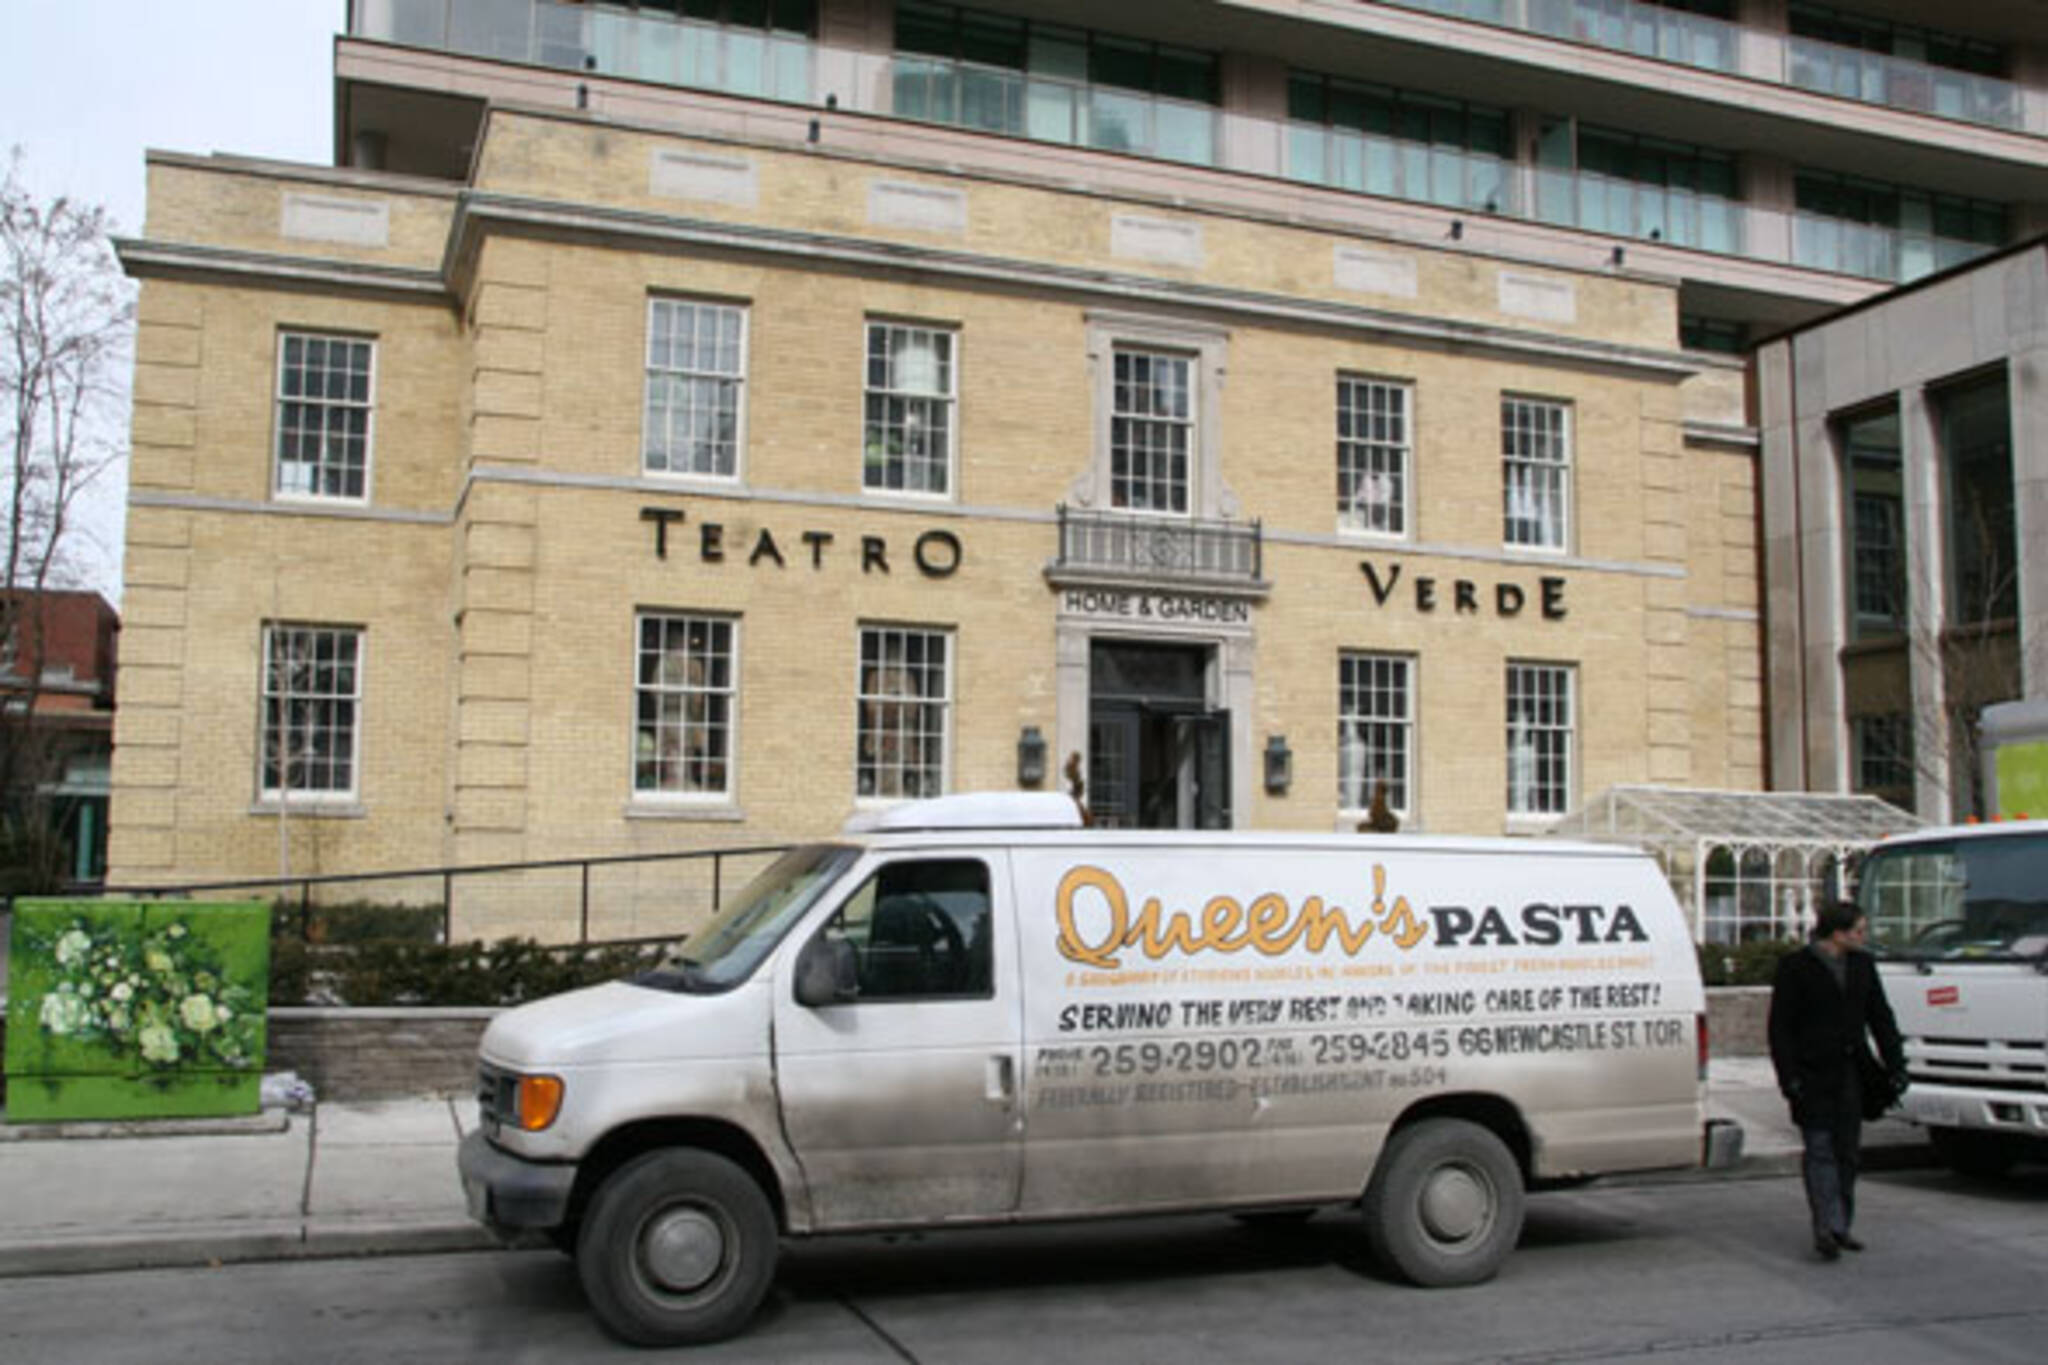 Teatro Verde Toronto